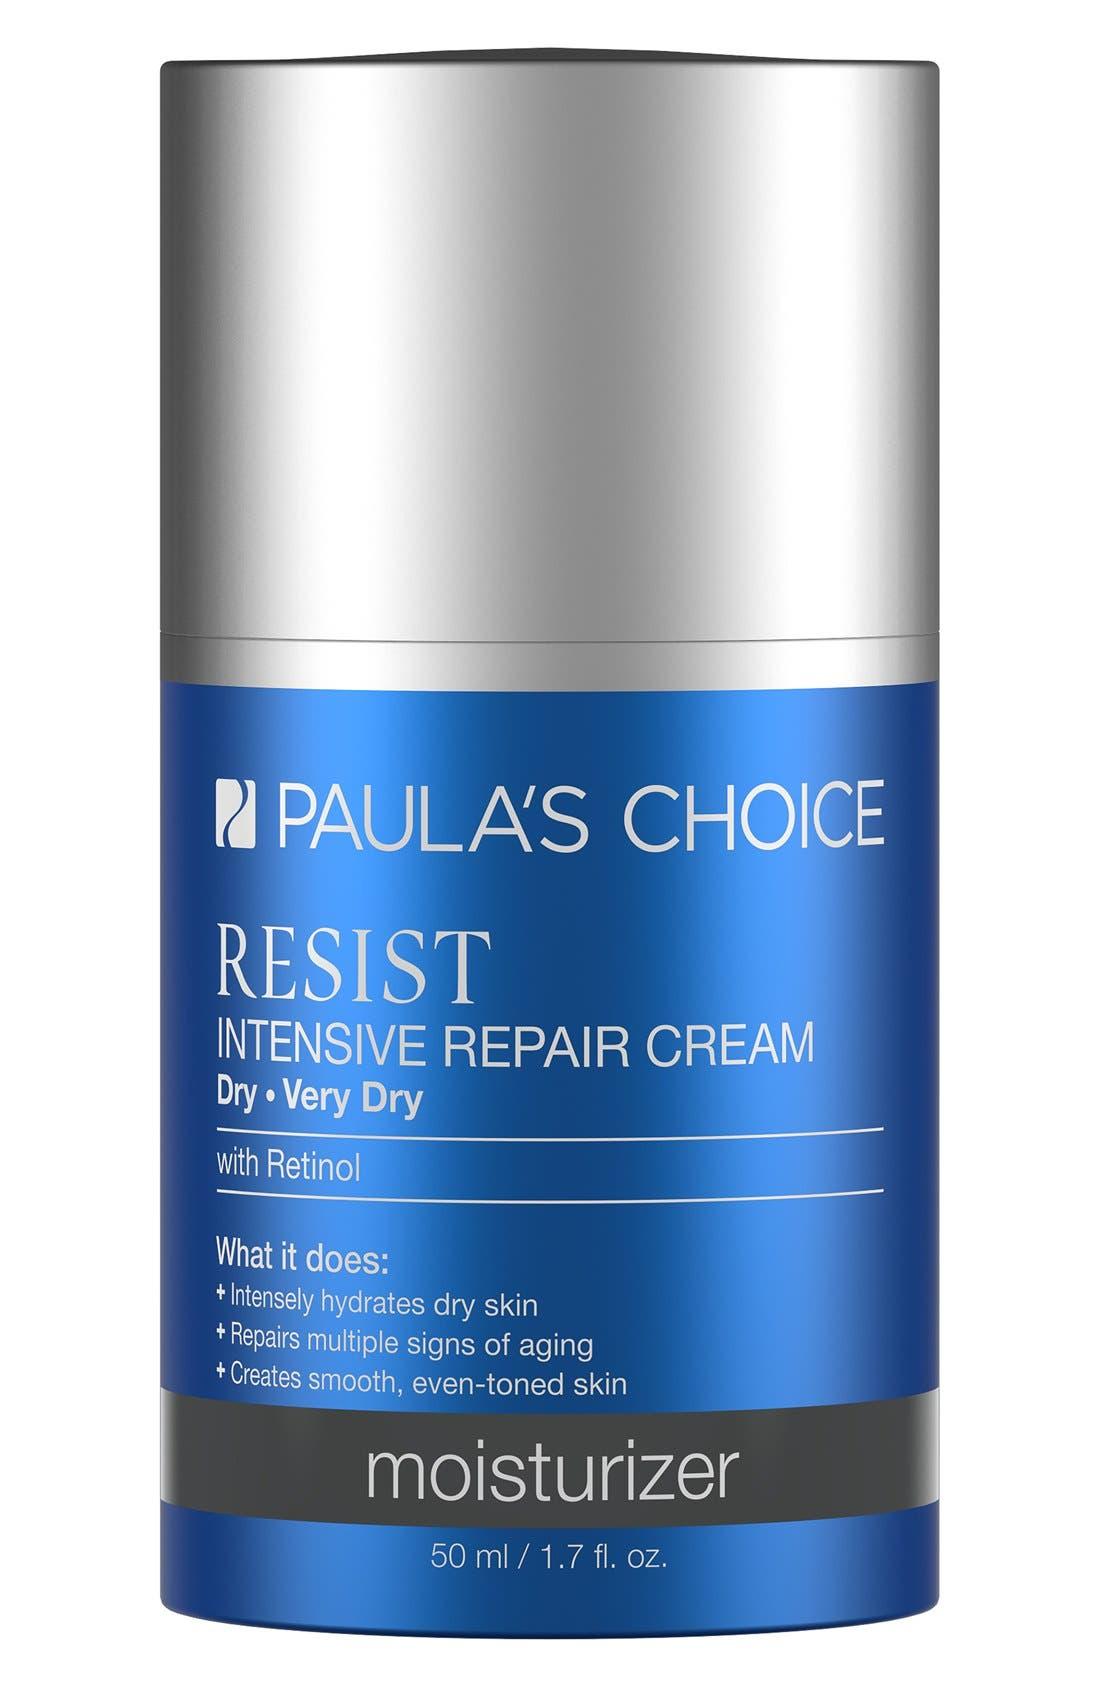 Paula's Choice Resist Intensive Repair Cream with Retinol